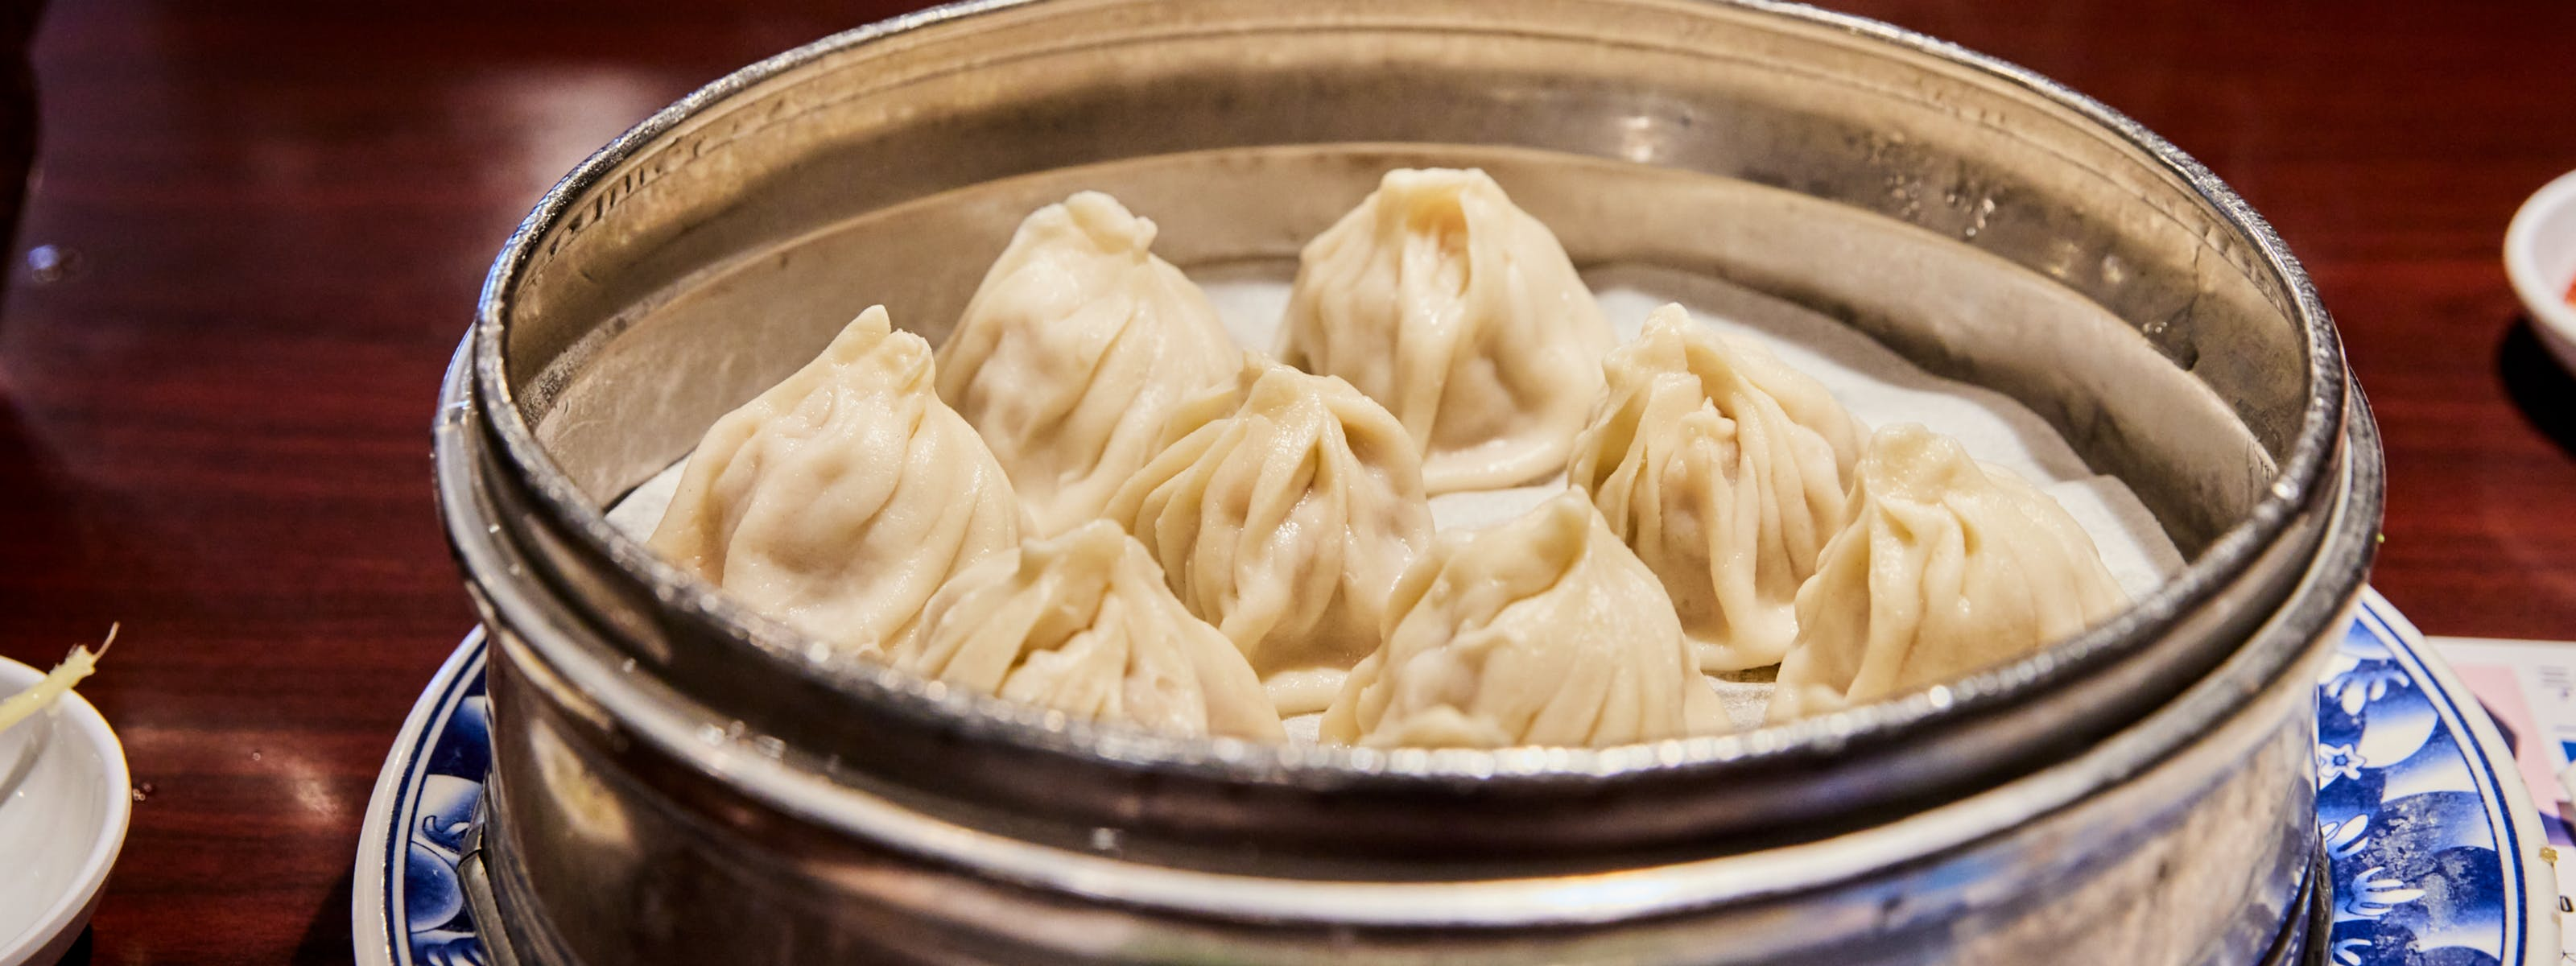 The Best Soup Dumplings In Los Angeles - Los Angeles - The Infatuation